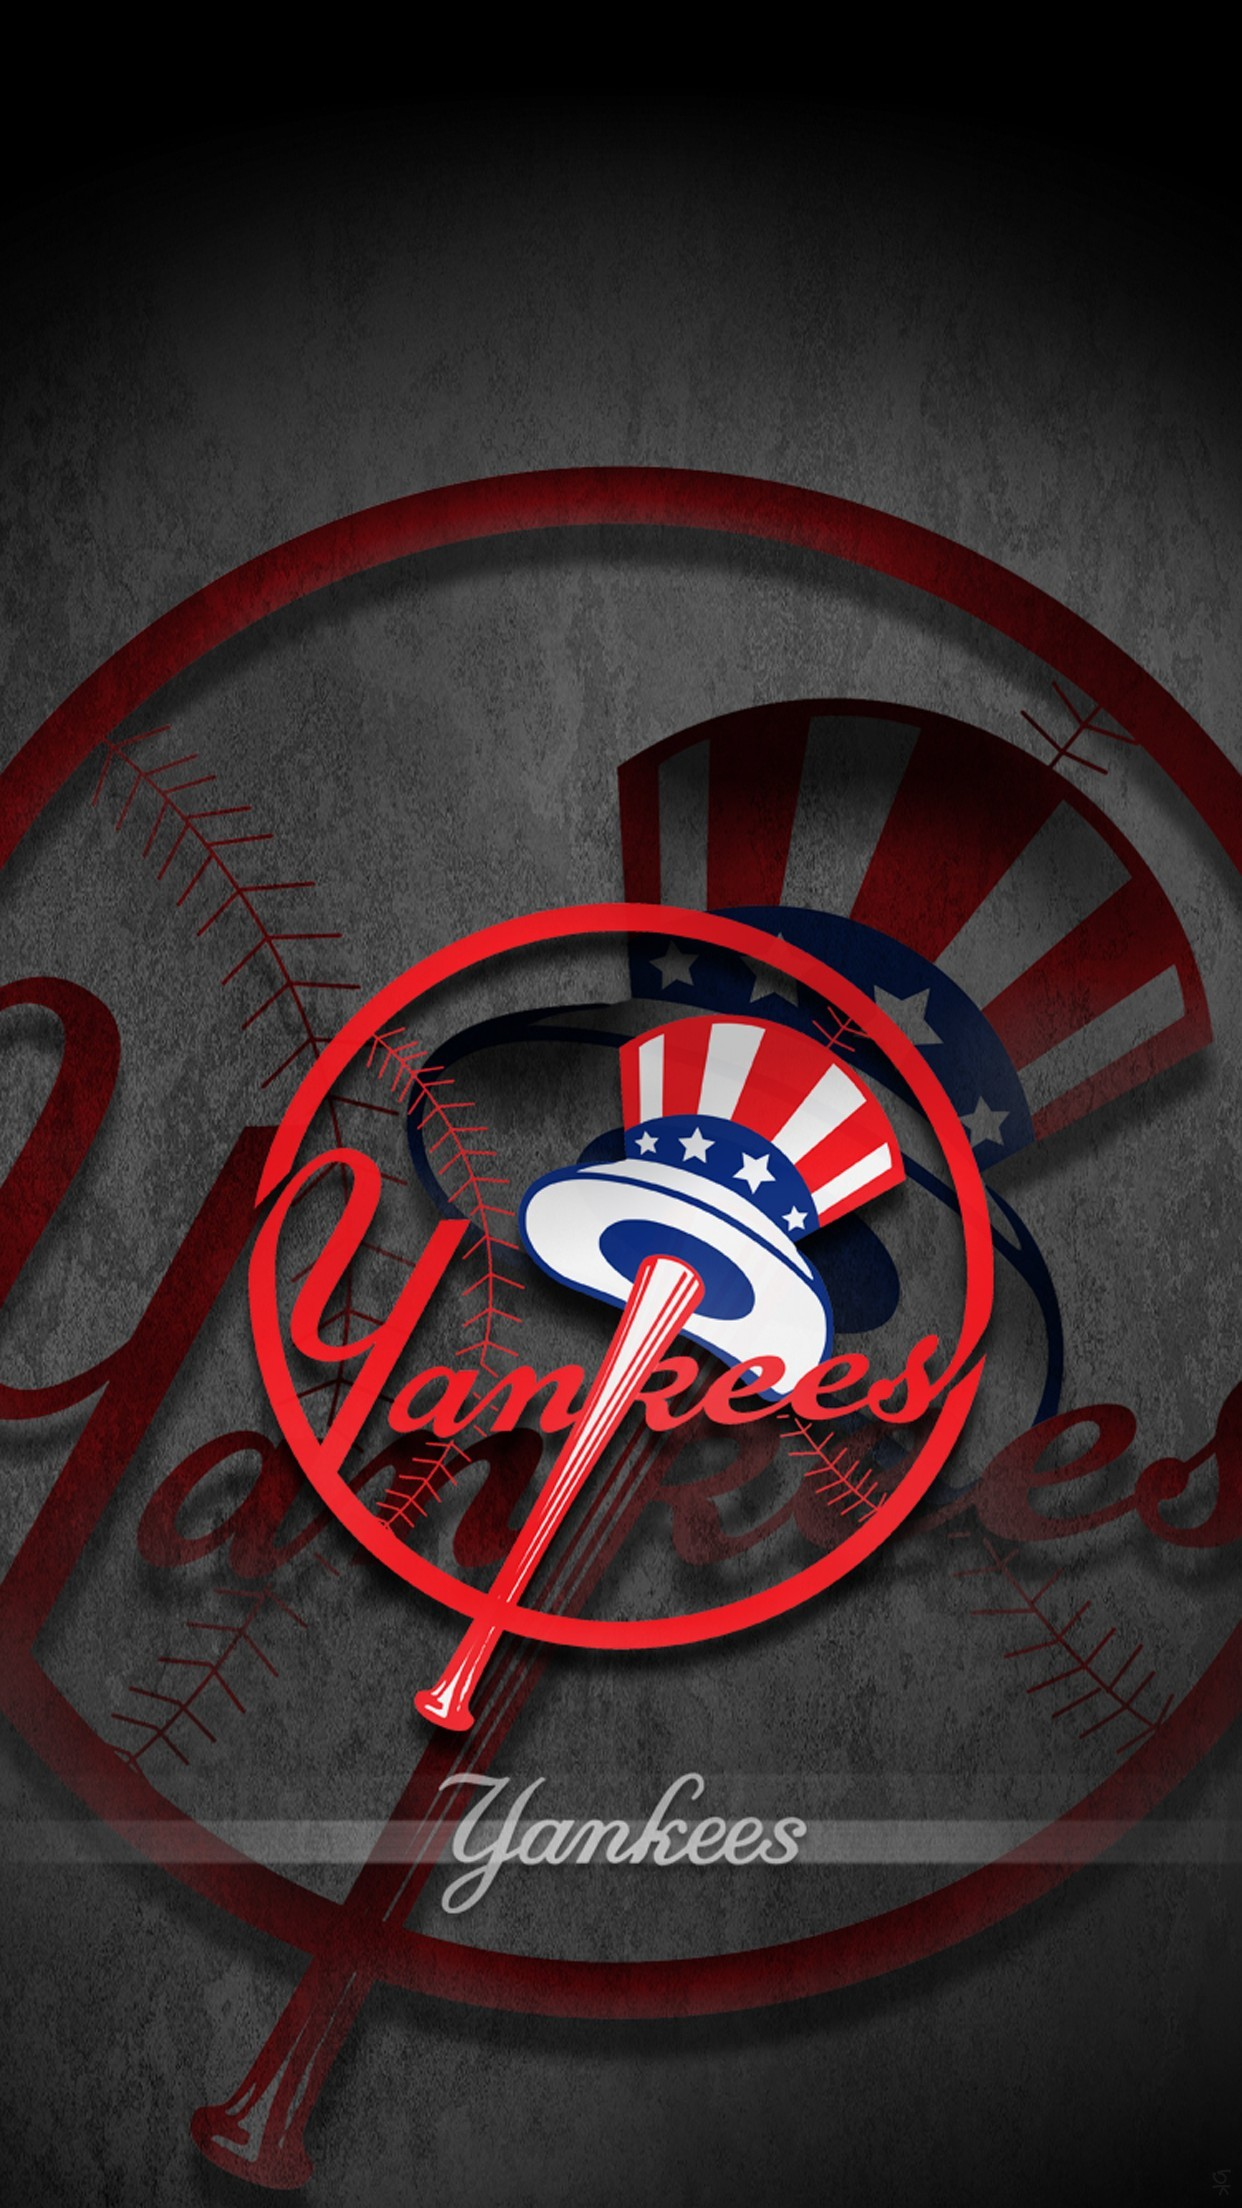 View Larger Image New York Yankees iPhone Wallpaper Logo